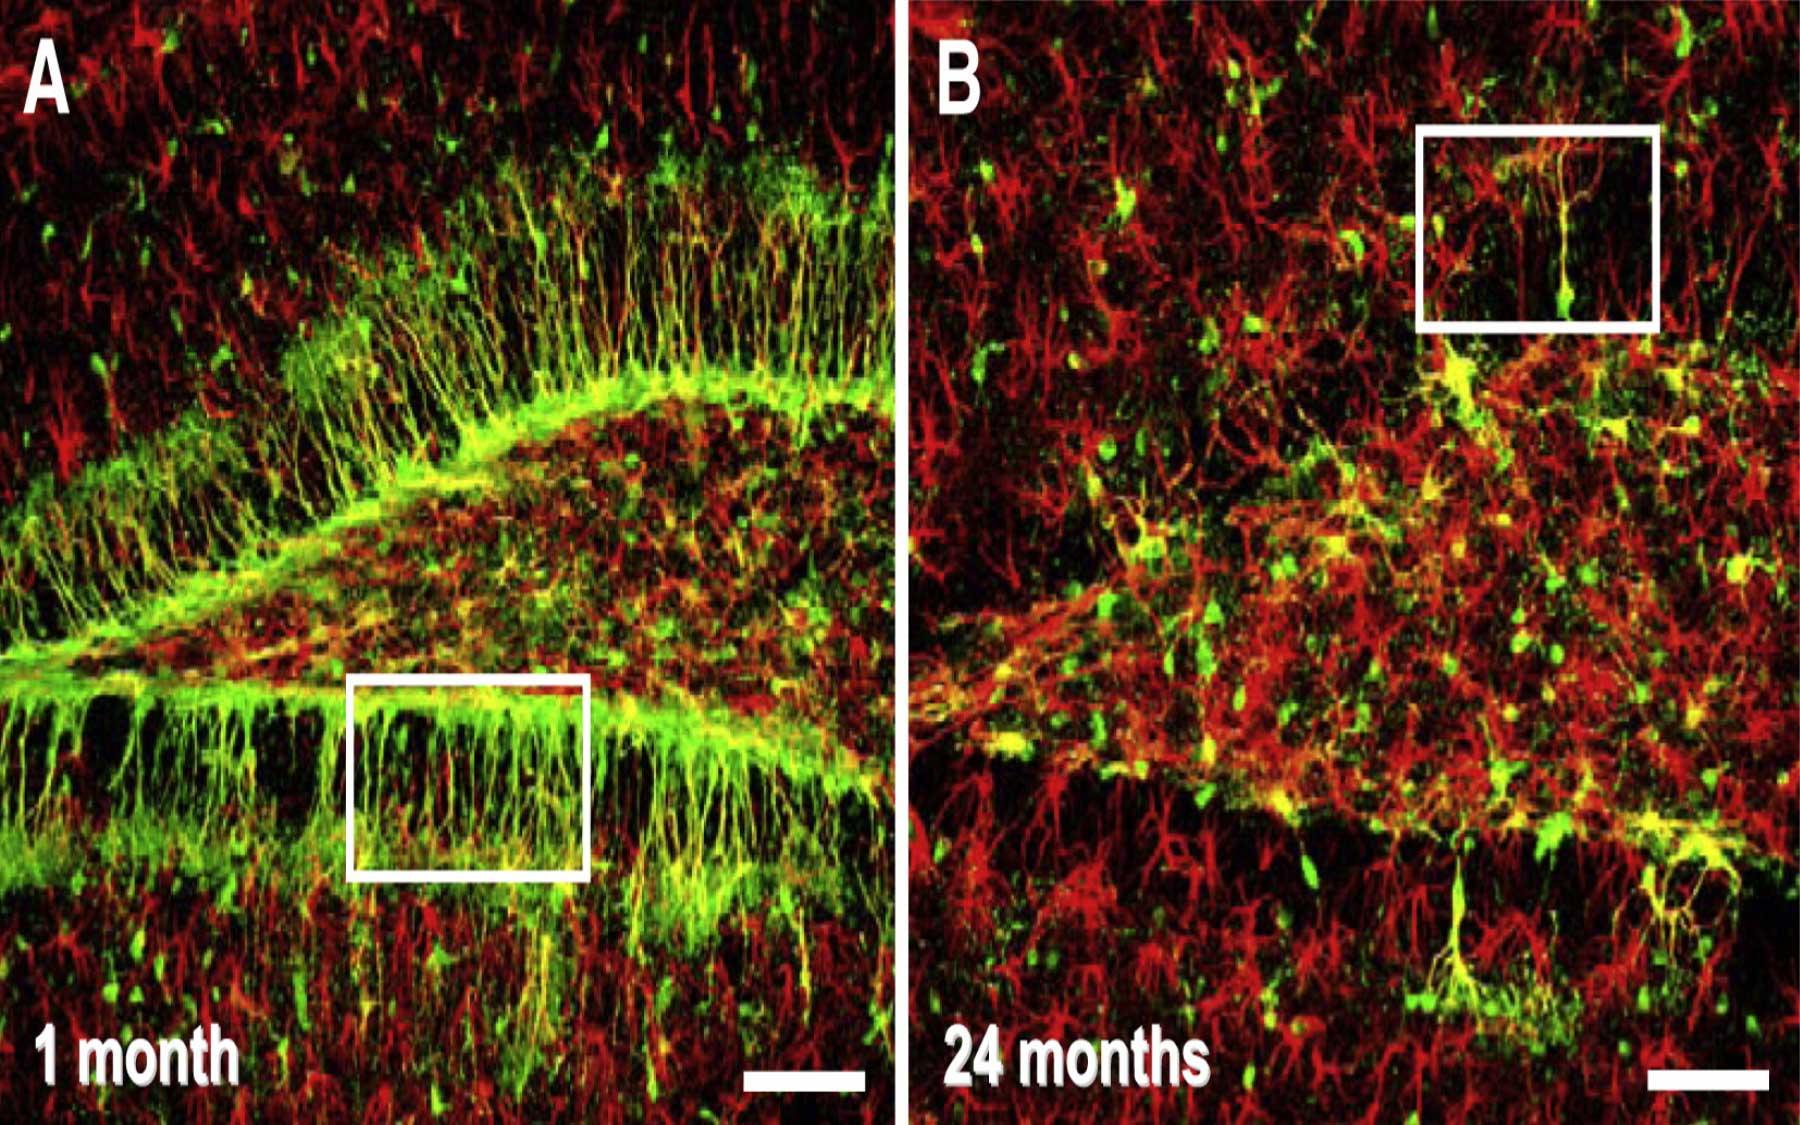 adult brain stem cells